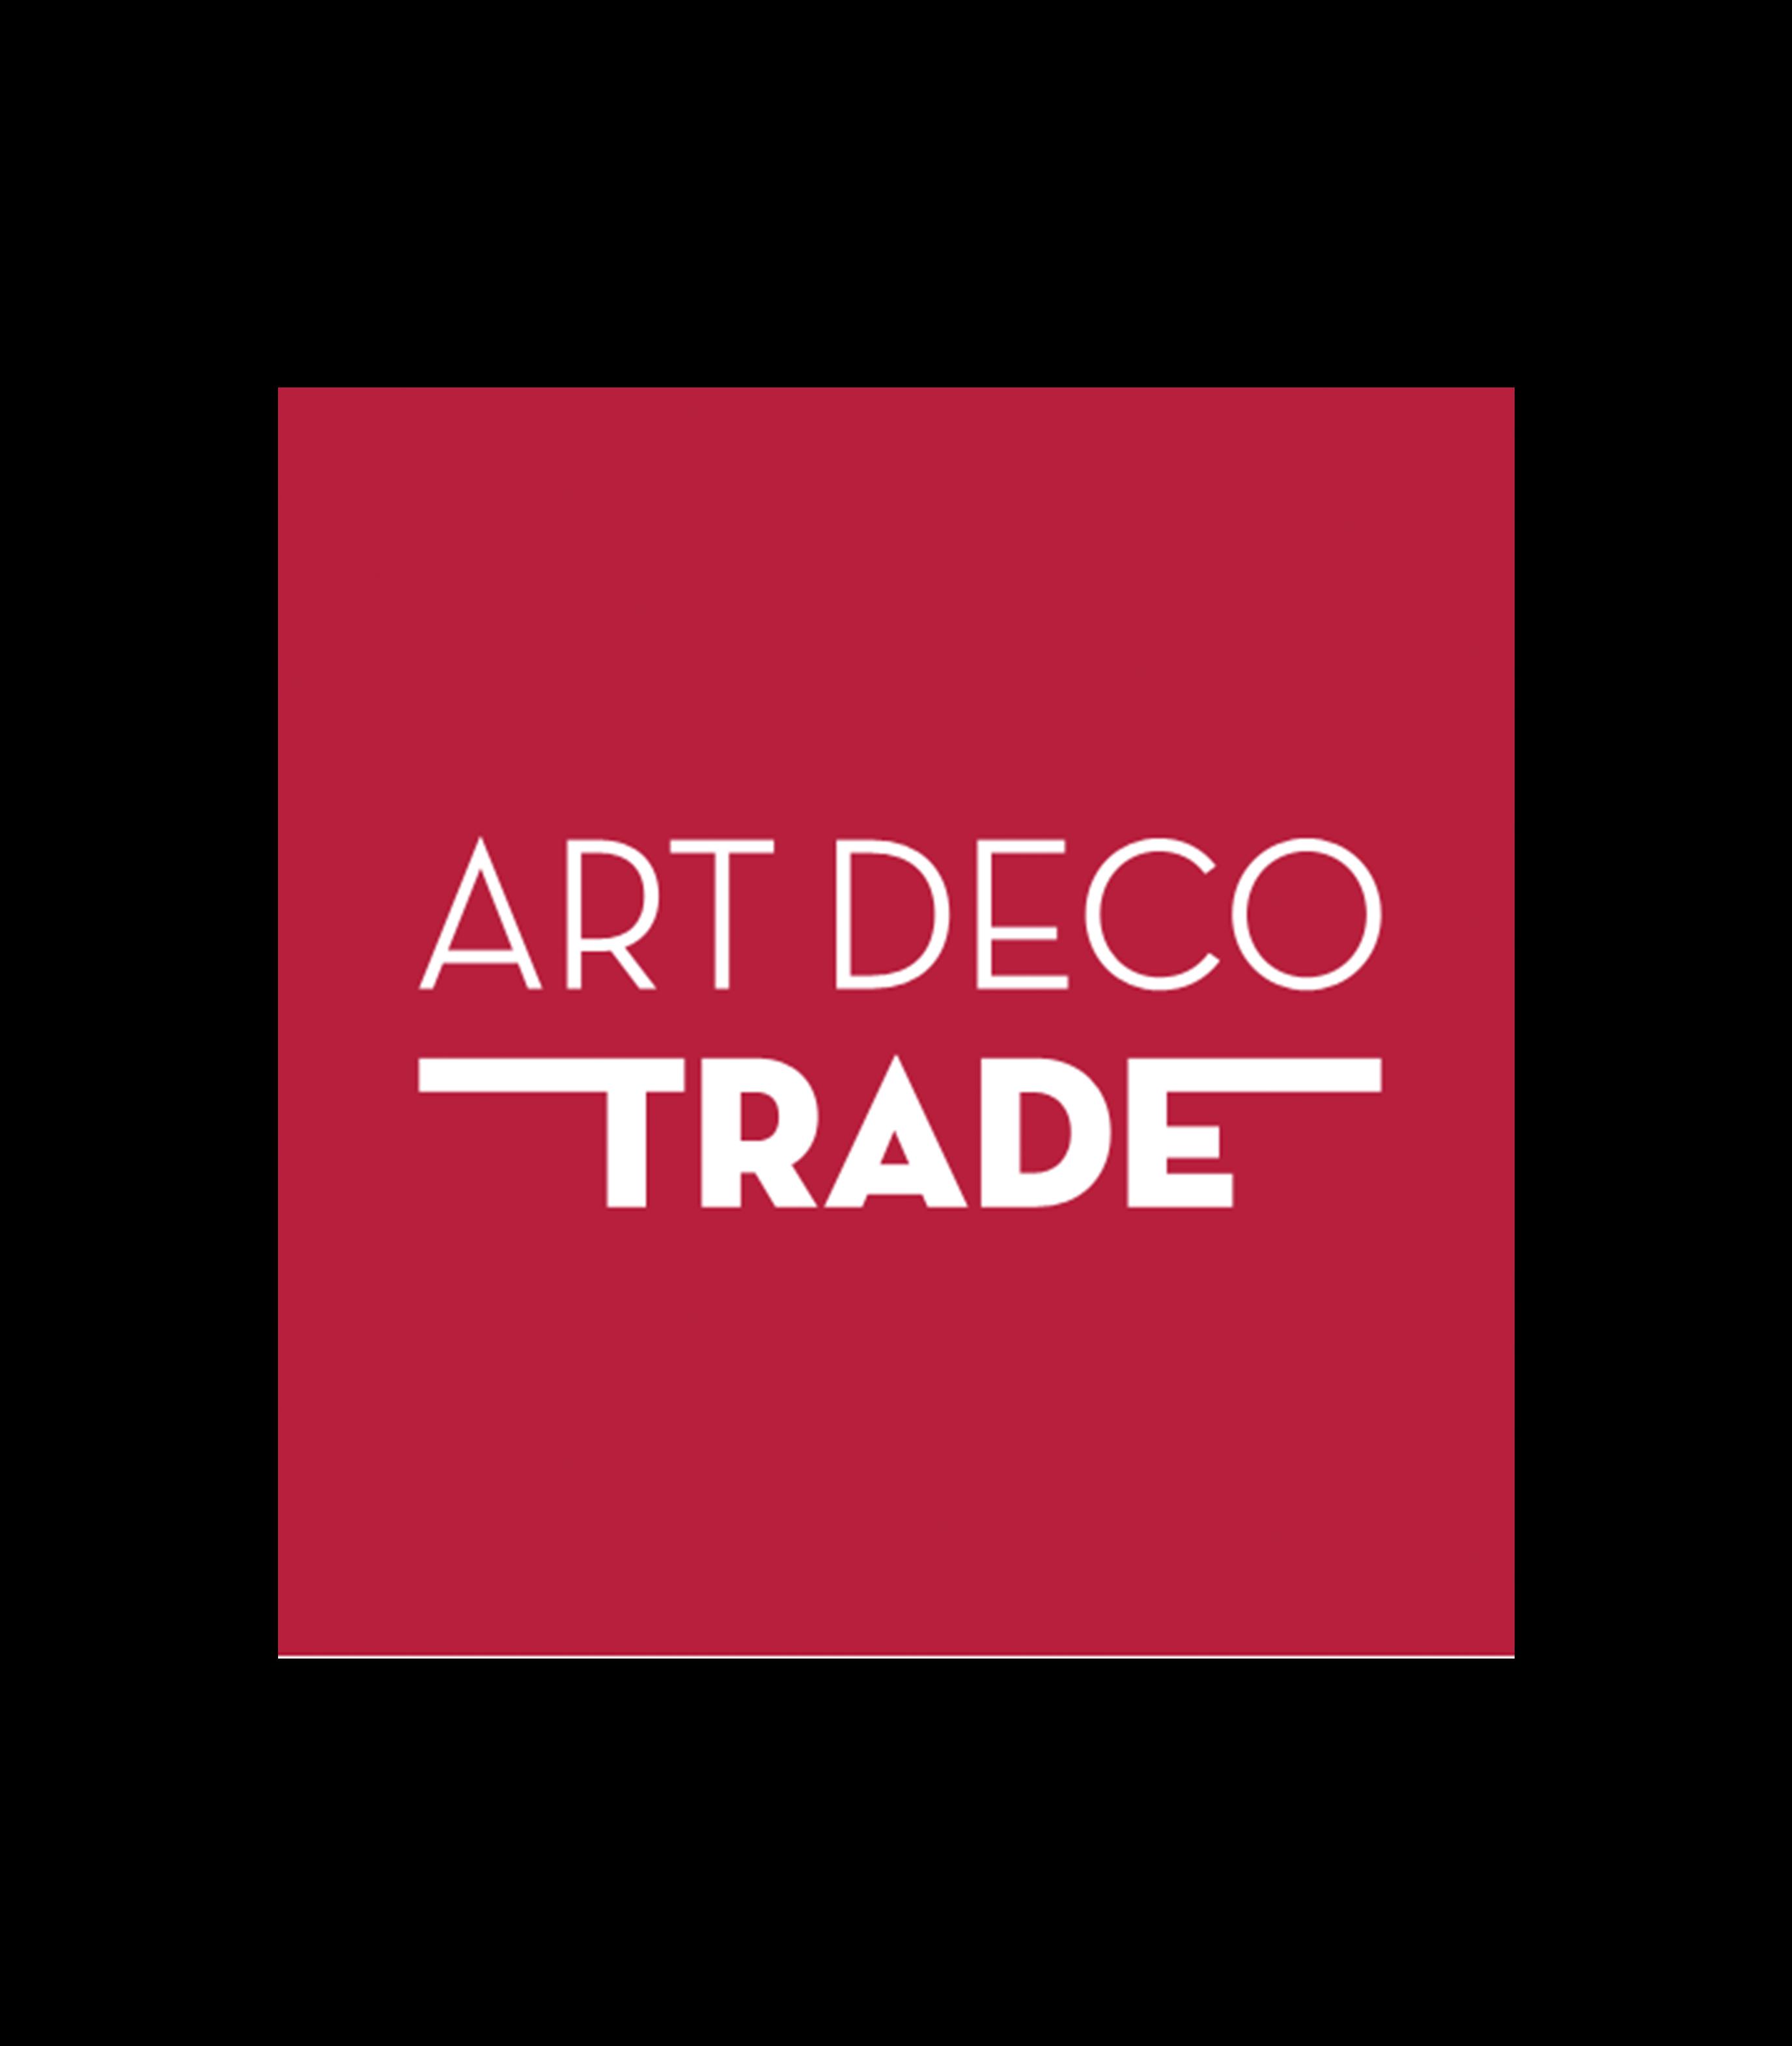 Art deco trade logo